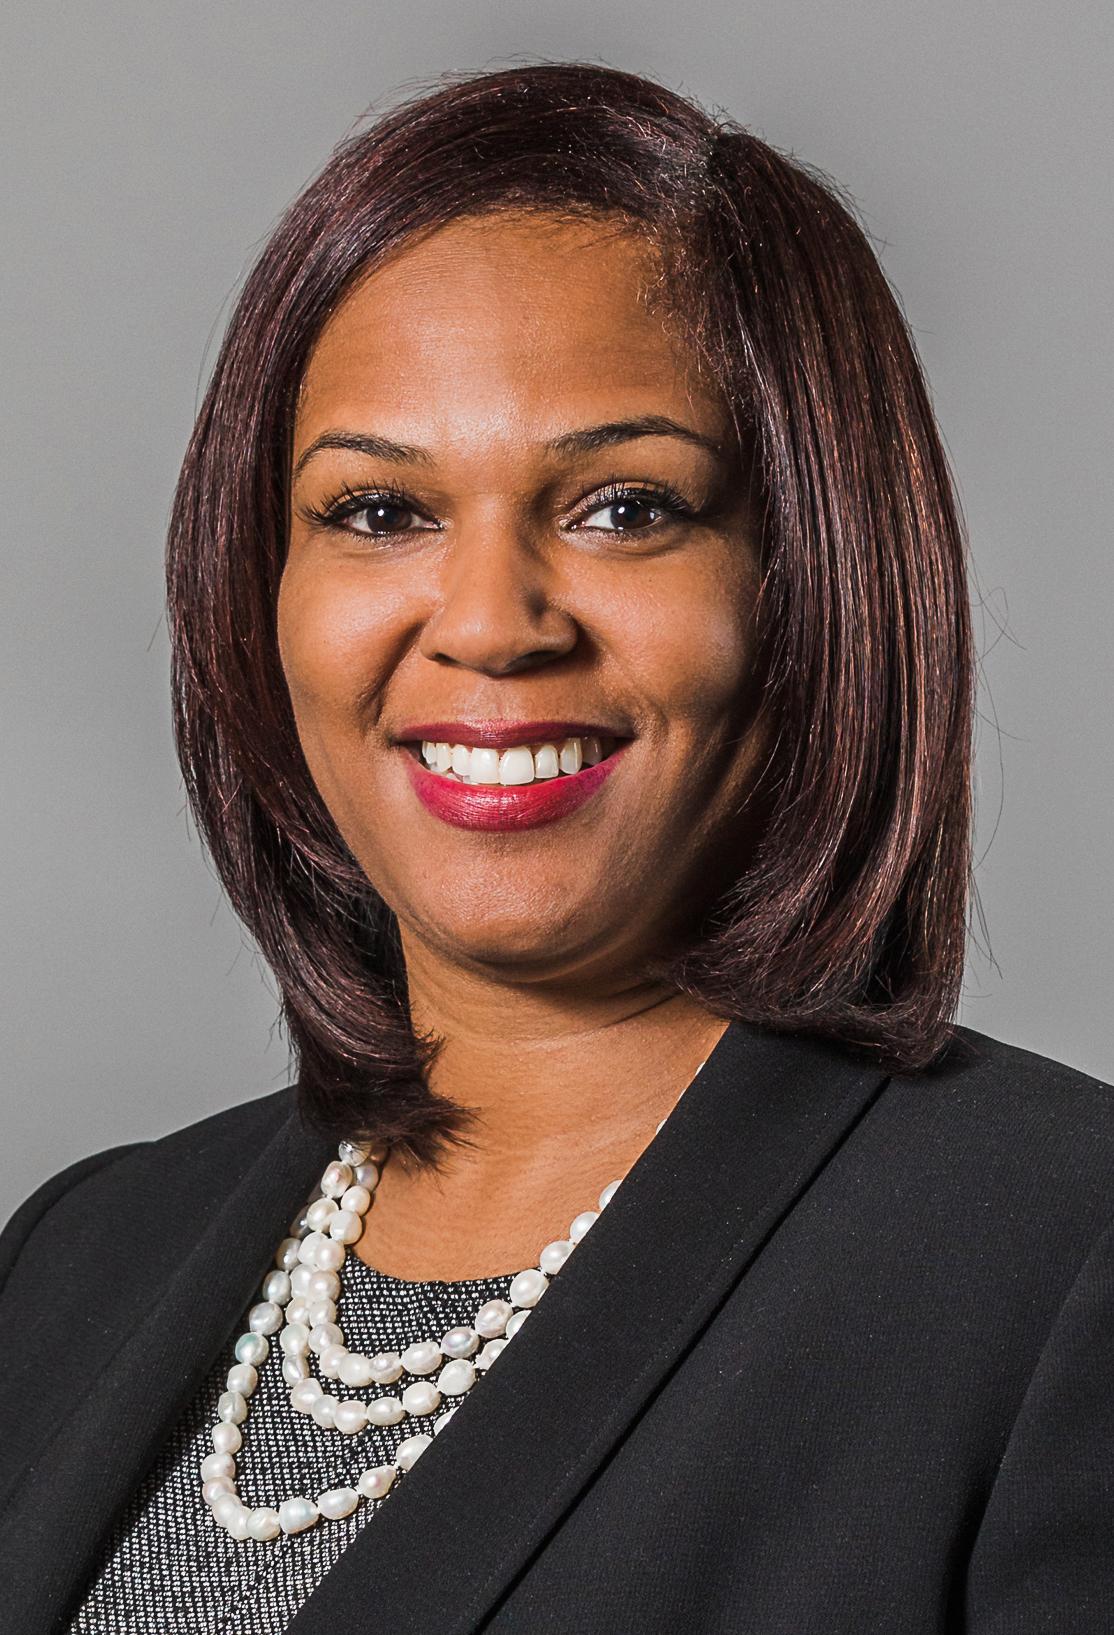 Courtney Dodd, Vice President of Partner Services